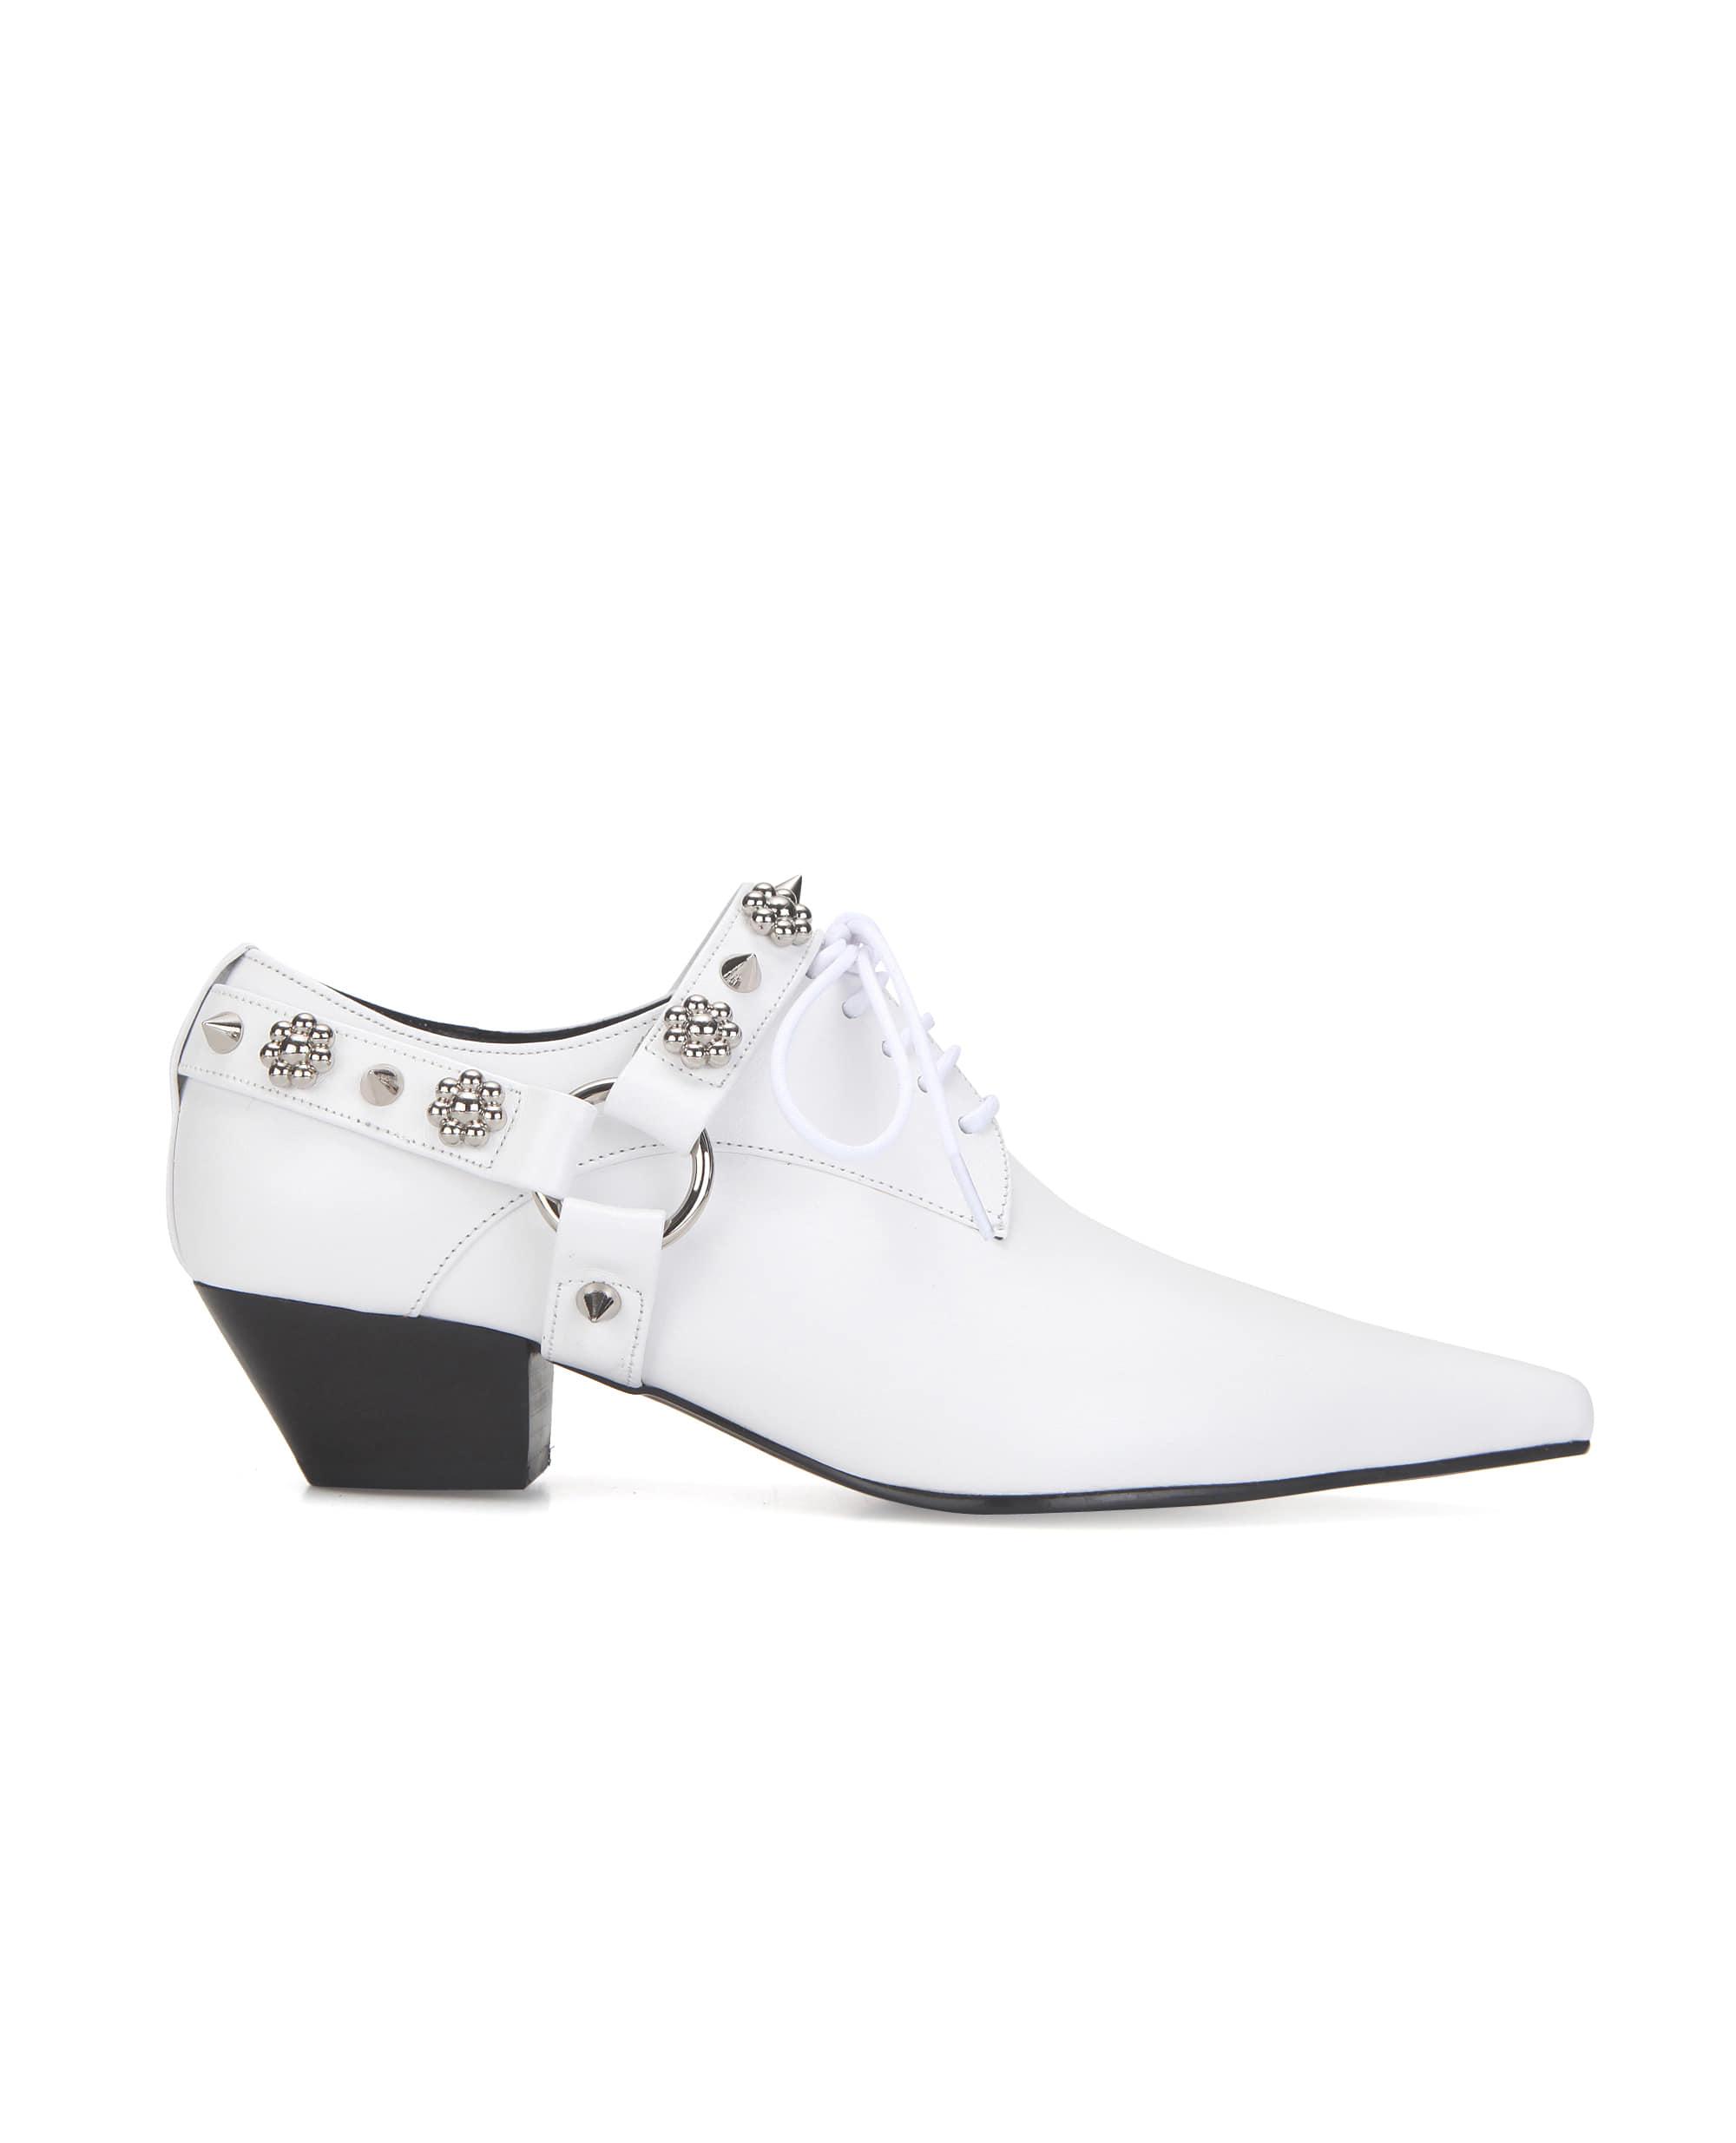 Extreme sharp toe flower derbys | White